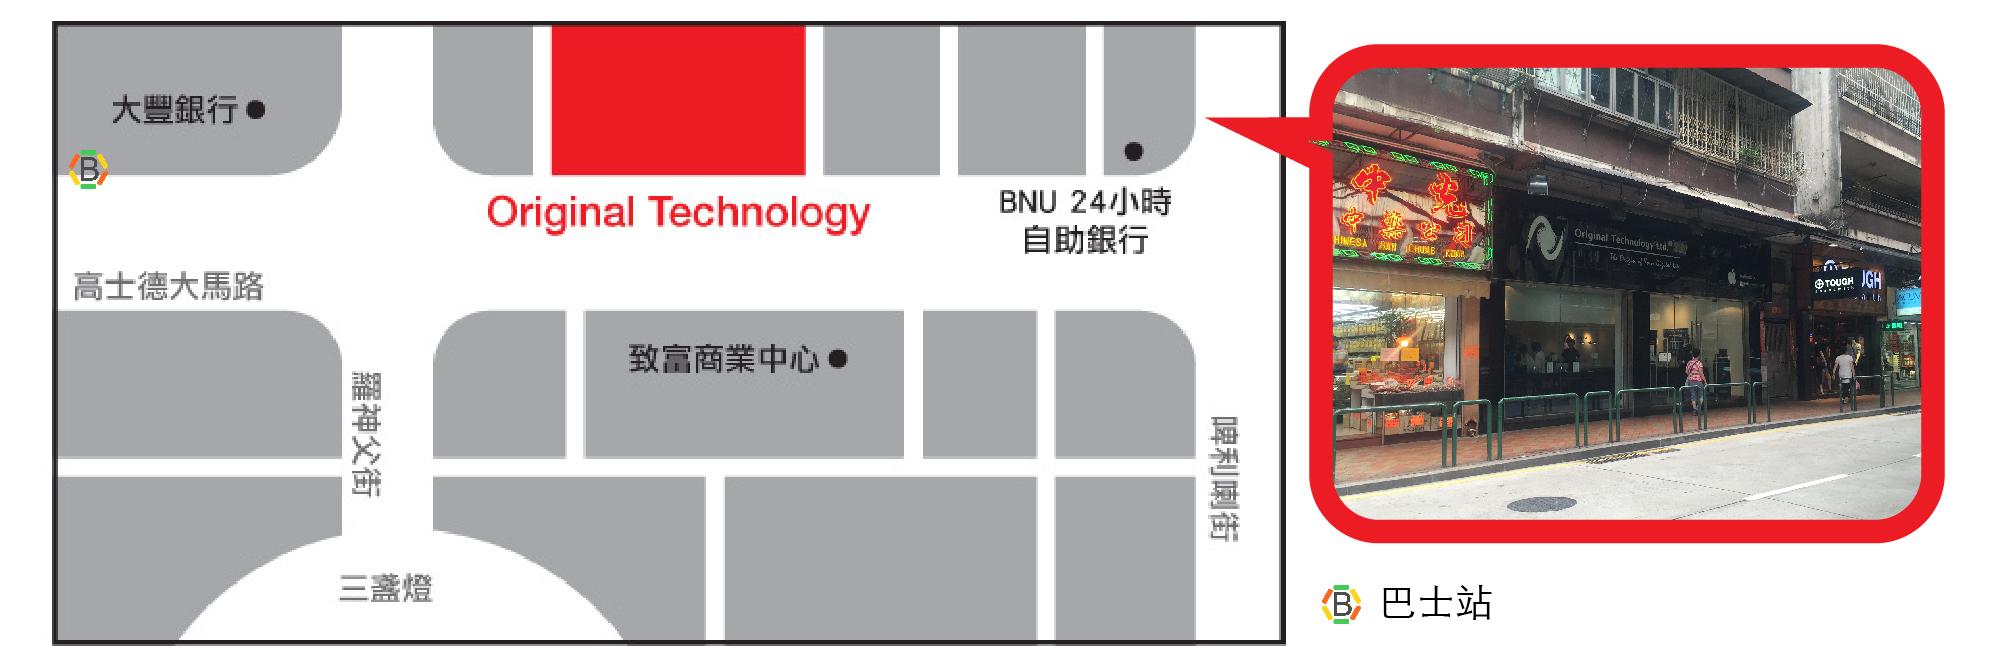 map_ht.jpg